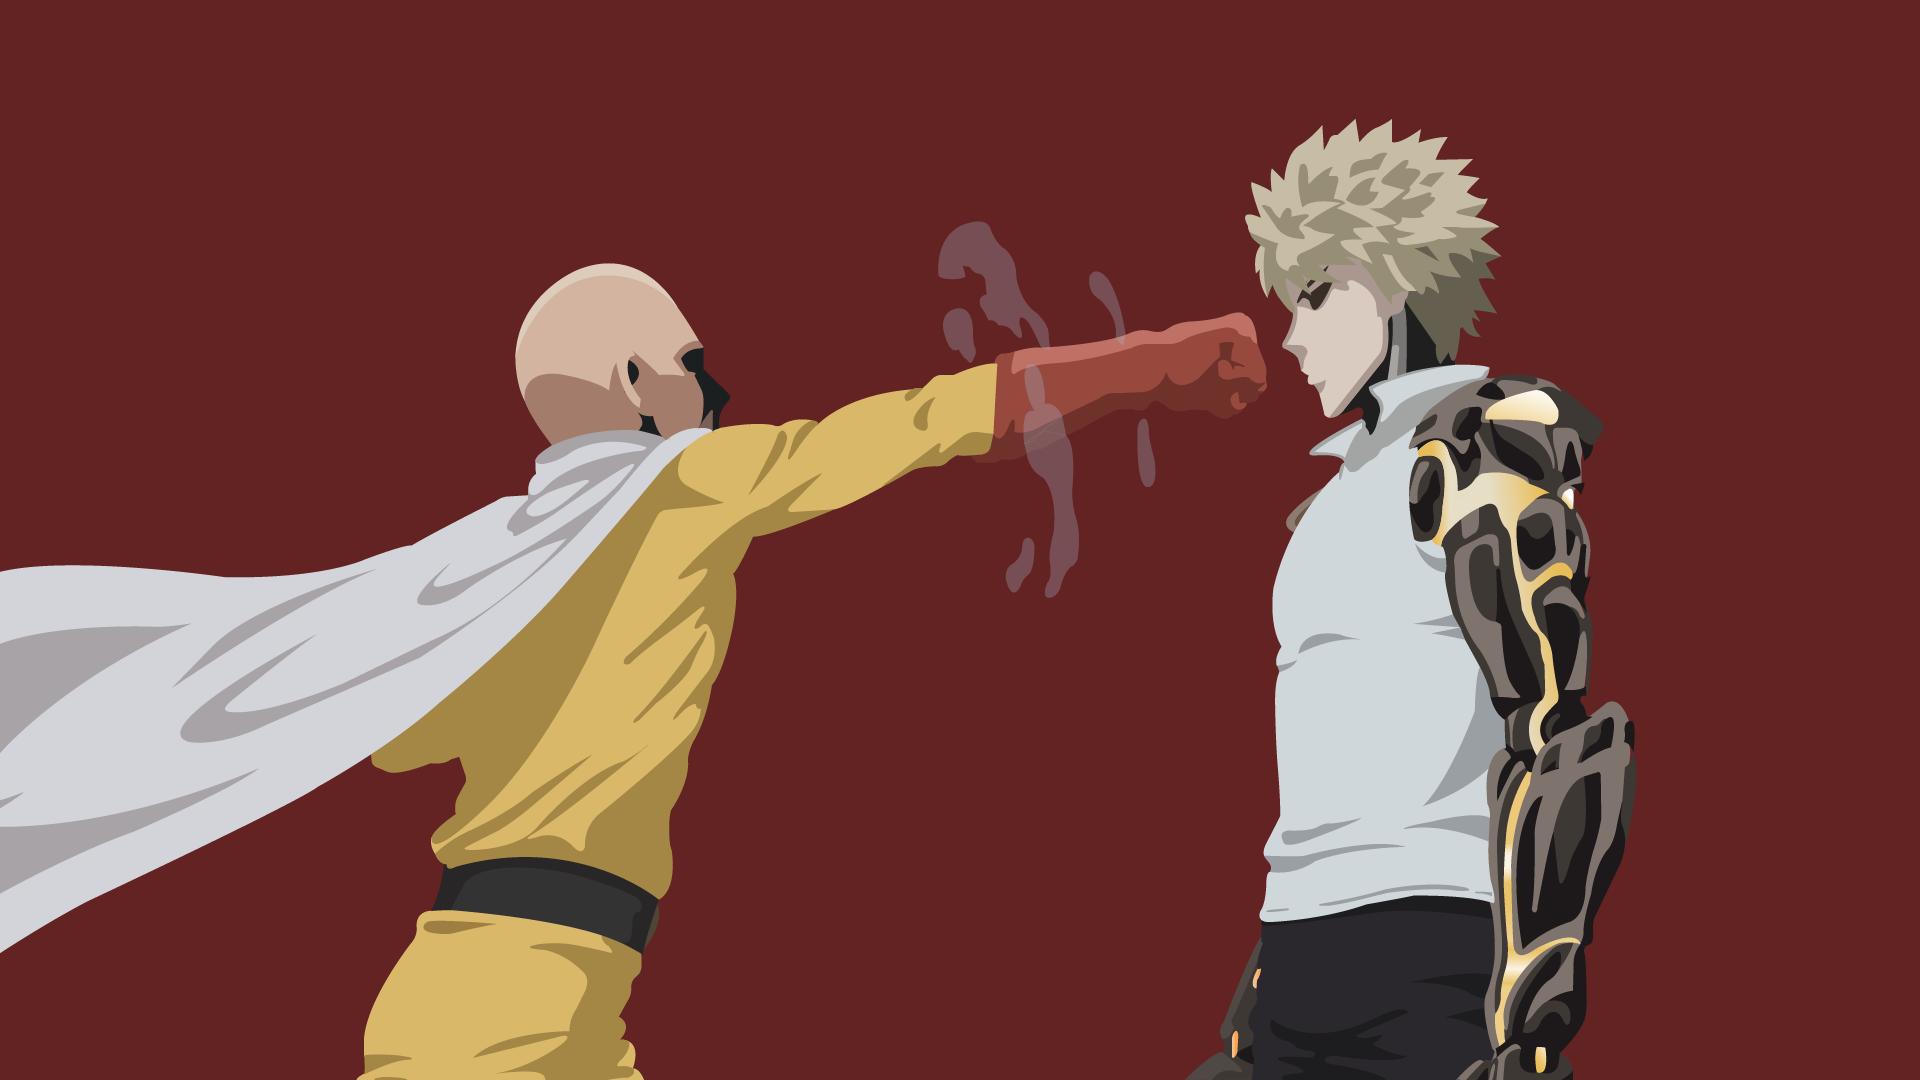 Saitama And Genos One Punch Man By Uzumakiash On Deviantart